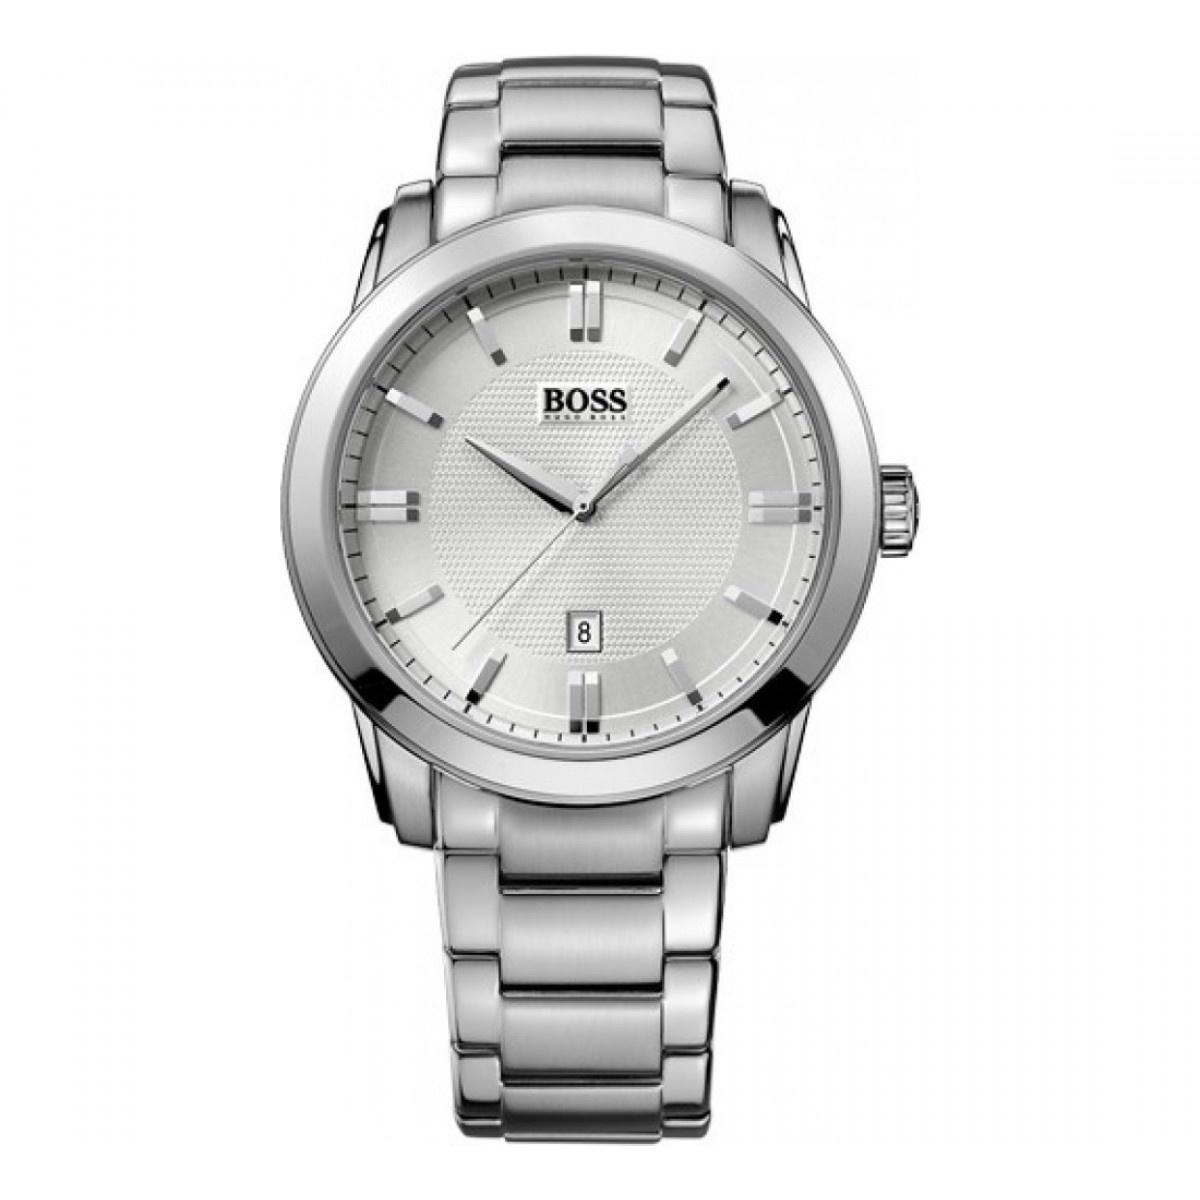 8ba98c54a5e Hugo Boss HB1512768 Herenhorloge - tot 65% korting| Wowwatch.nl